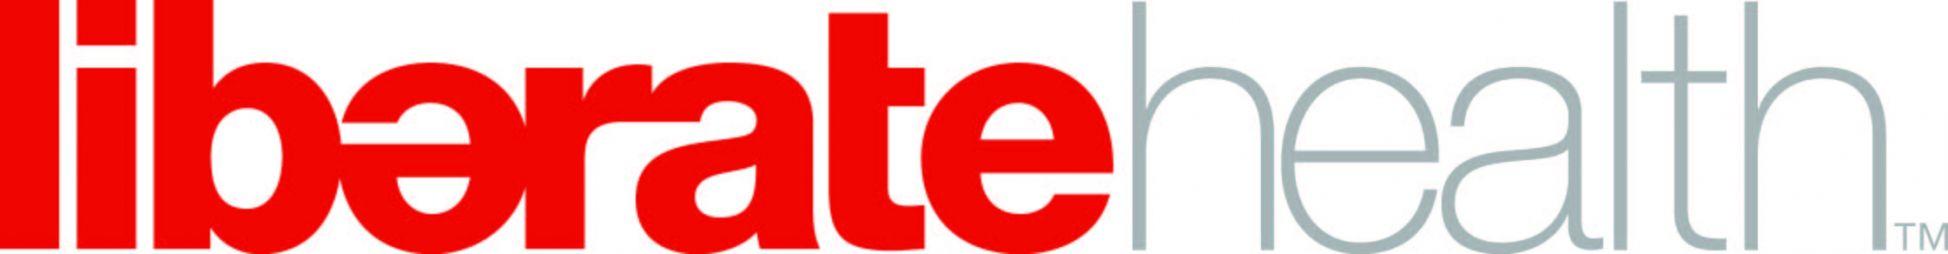 Liberate, Inc. Logo